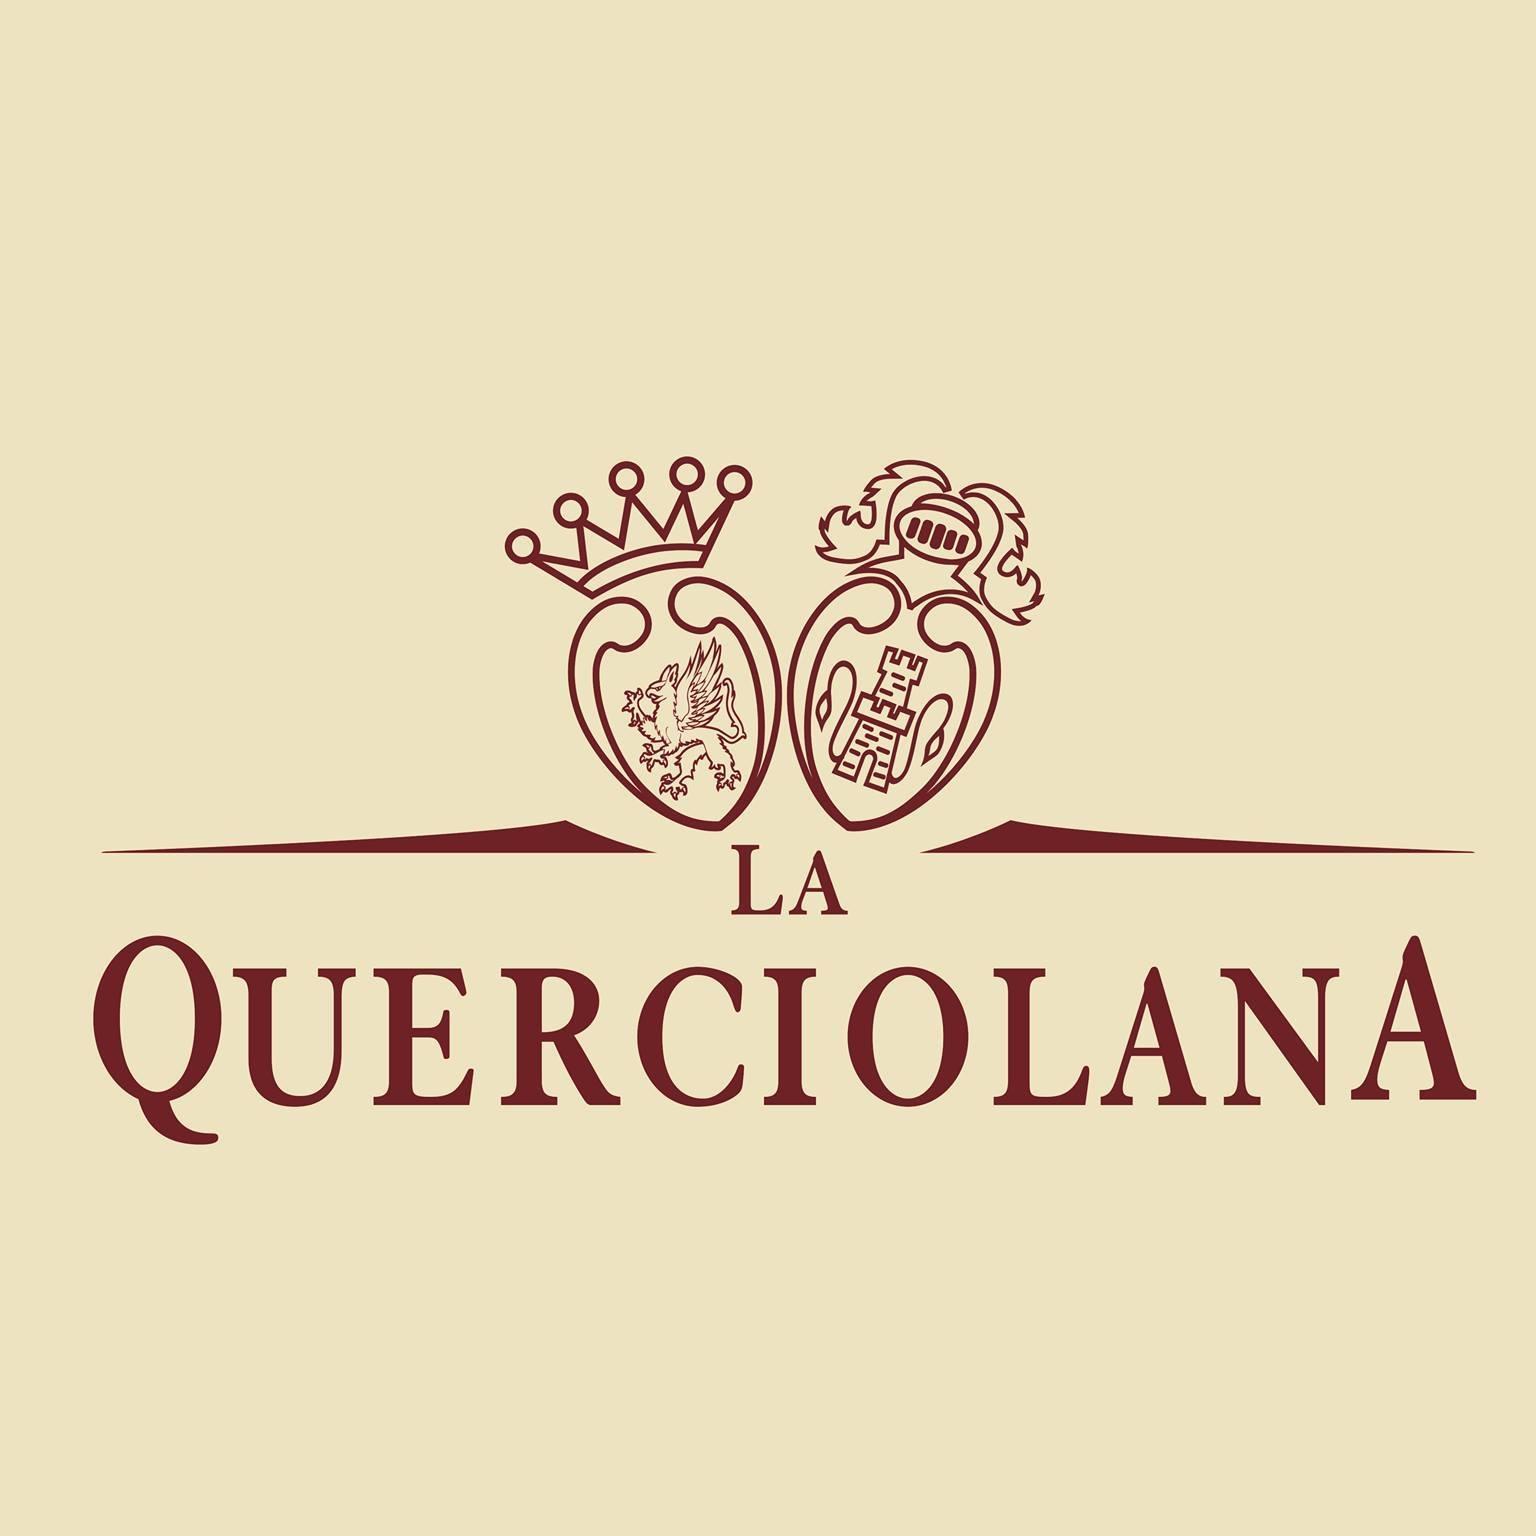 La Querciolana